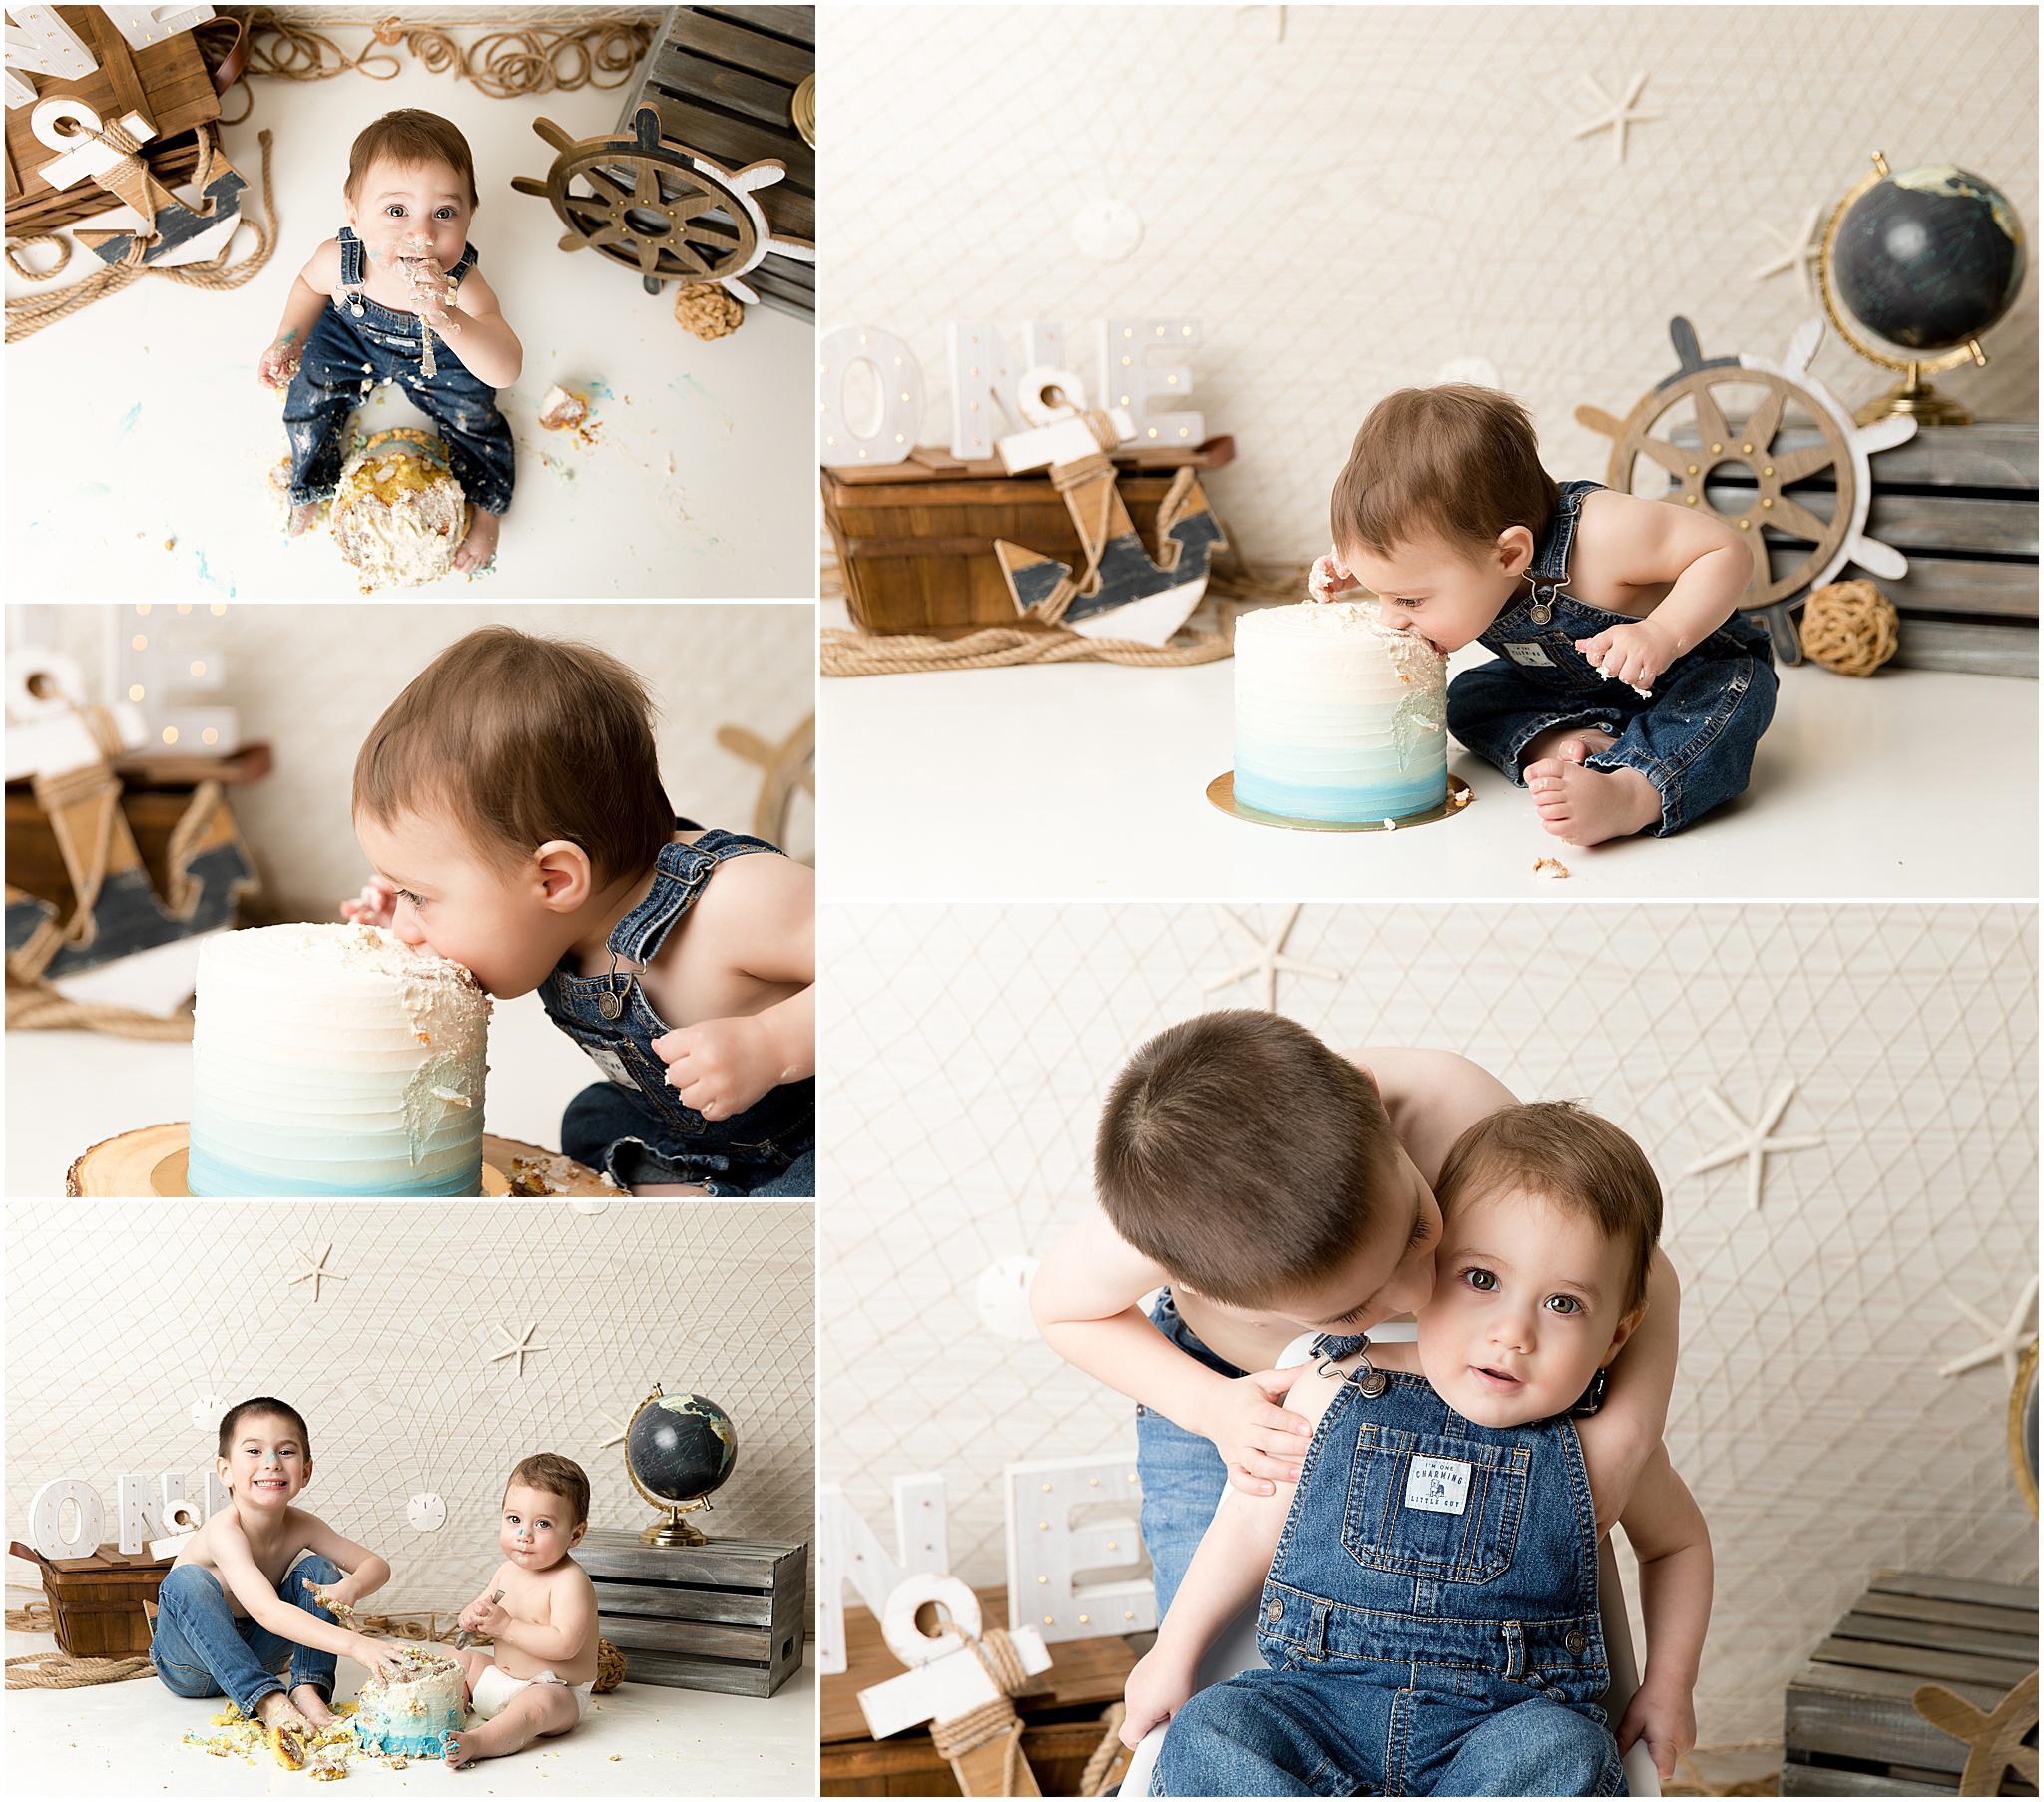 cakesmash+photography+Luciana+Golcman+NYC+36.jpg